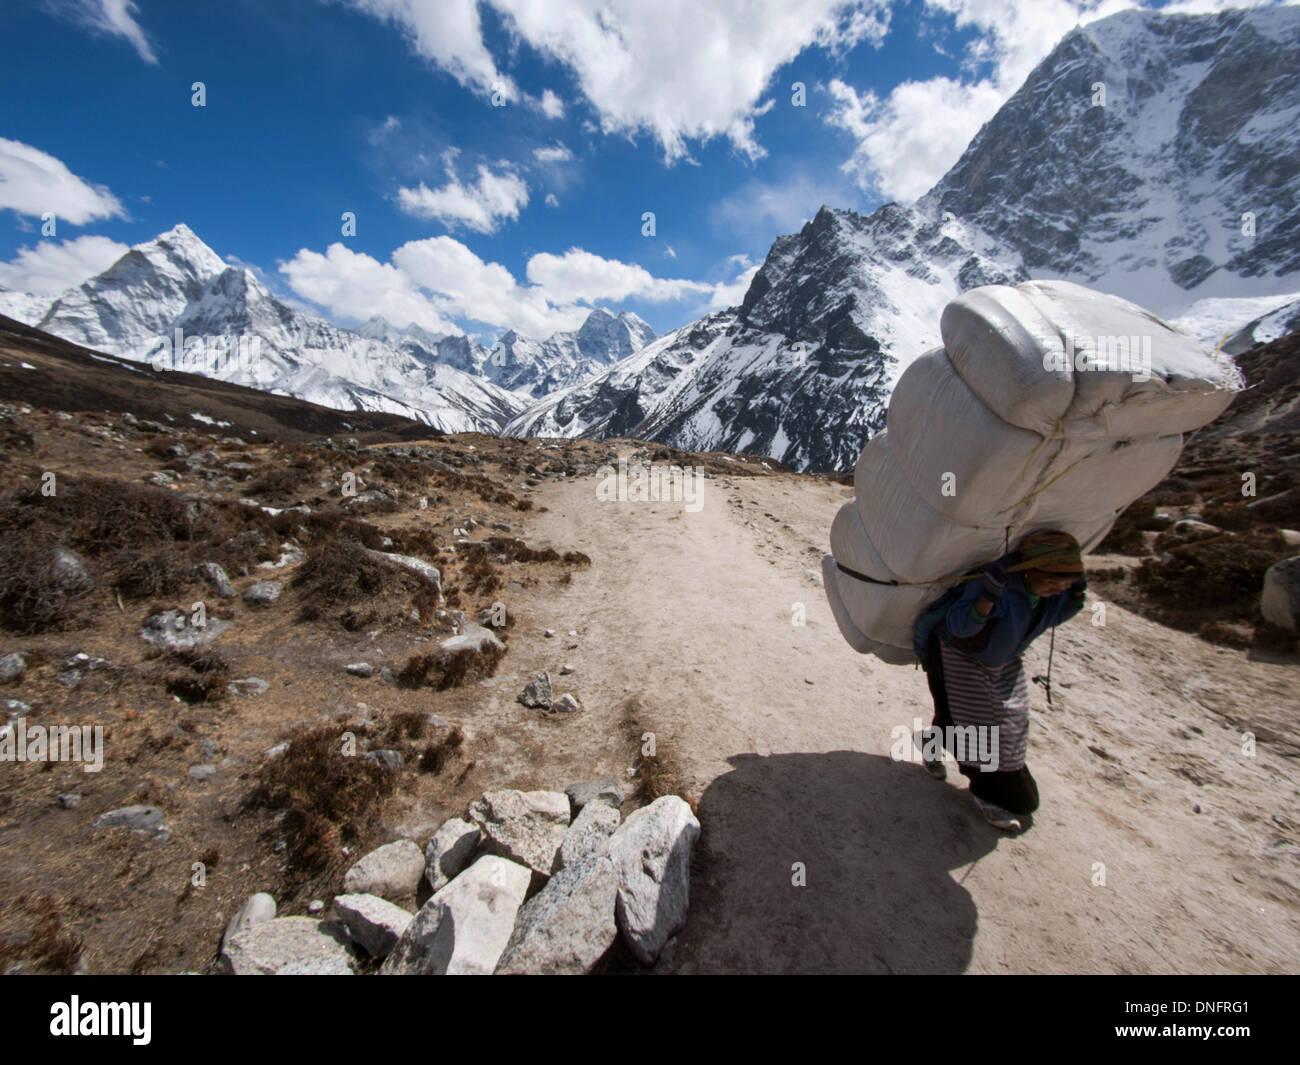 A Sherpa porter carries a large load uphill near Lobuche, Everest Base Camp Trek, Khumbu Region, Nepal. - Stock Image